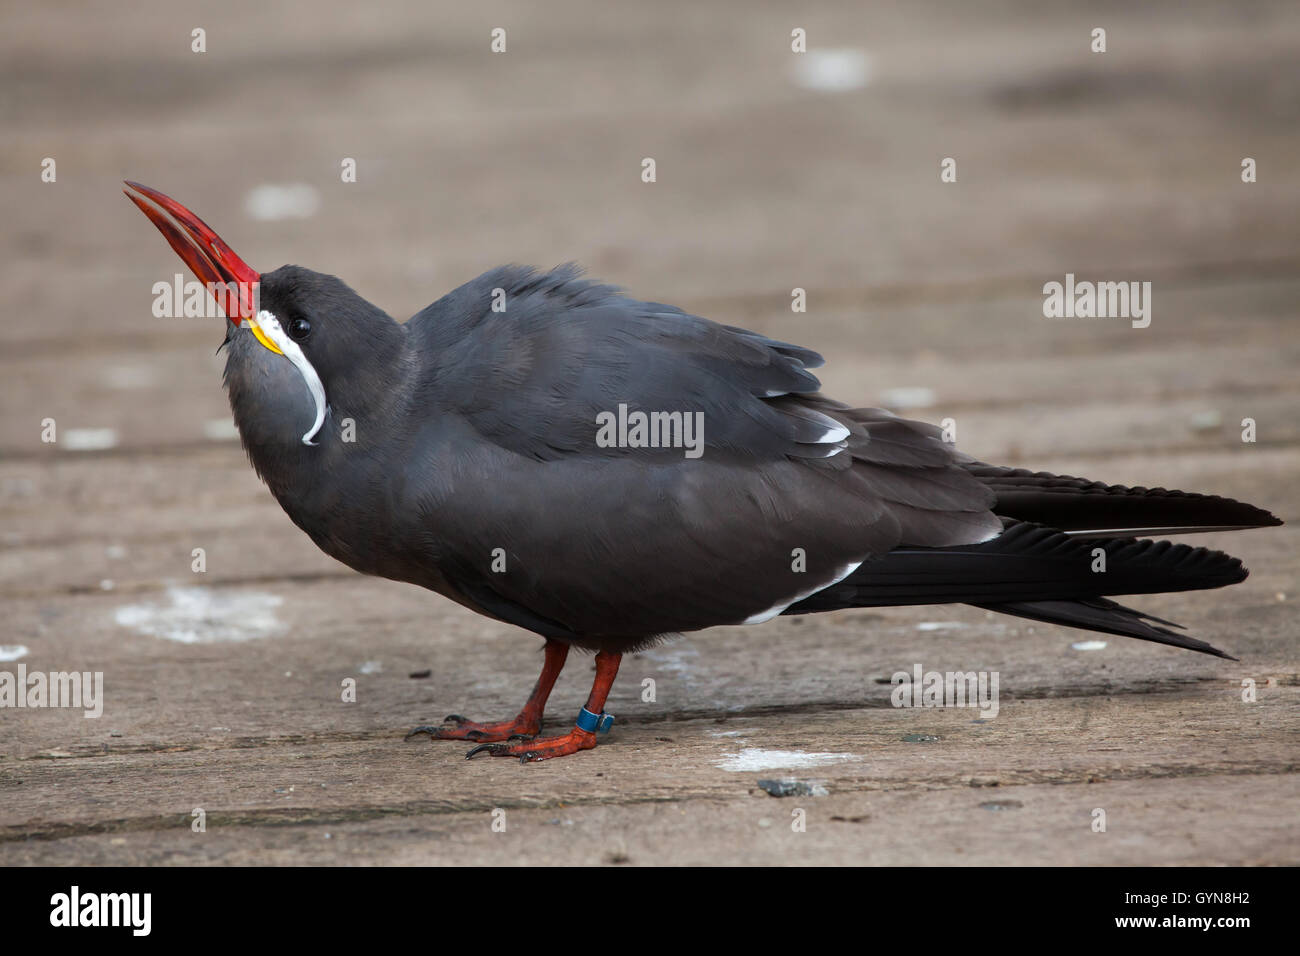 Inca tern (Larosterna inca). Wildlife animal. Stock Photo